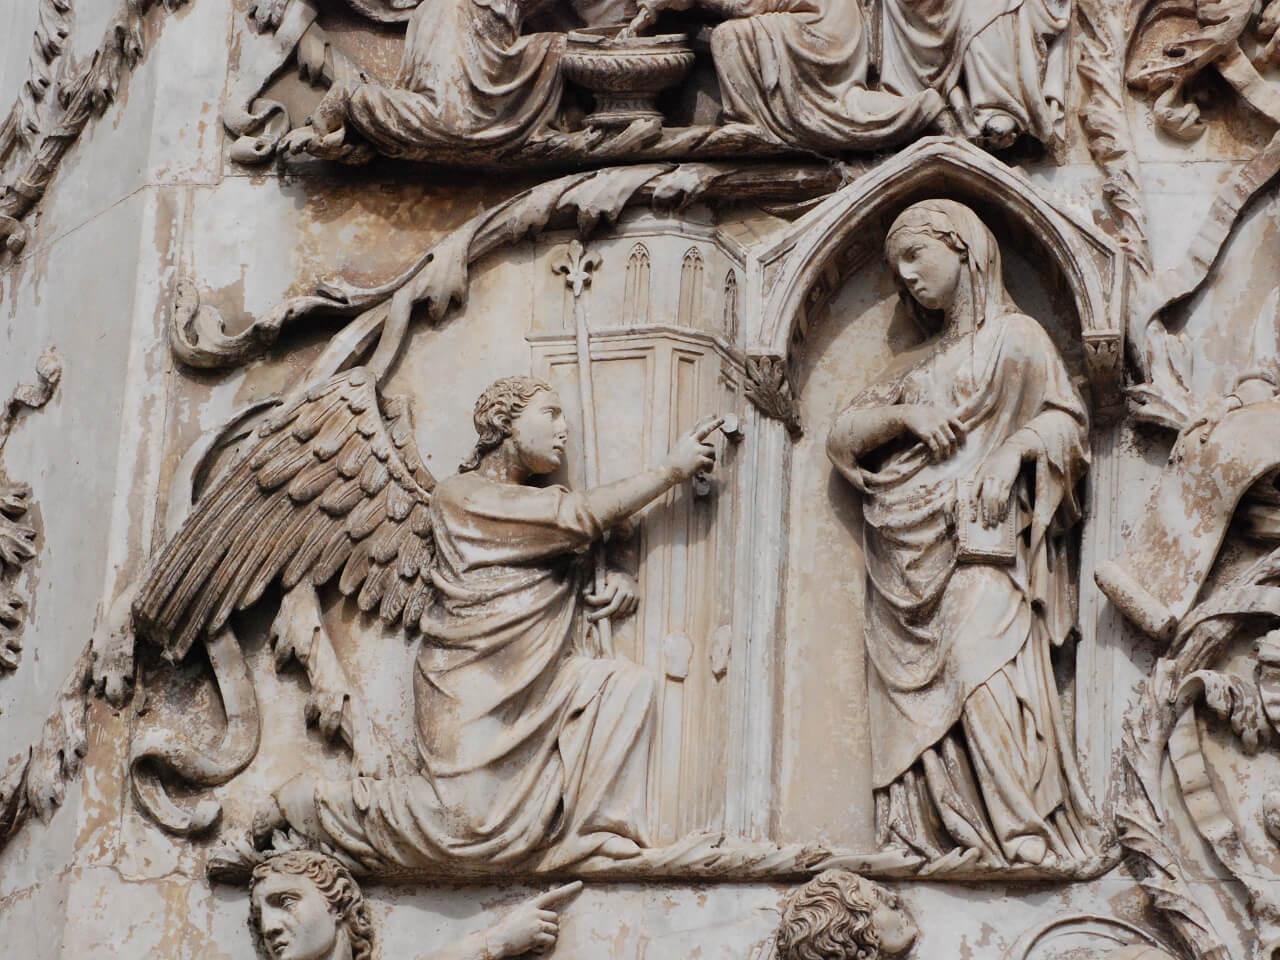 maria stone angel